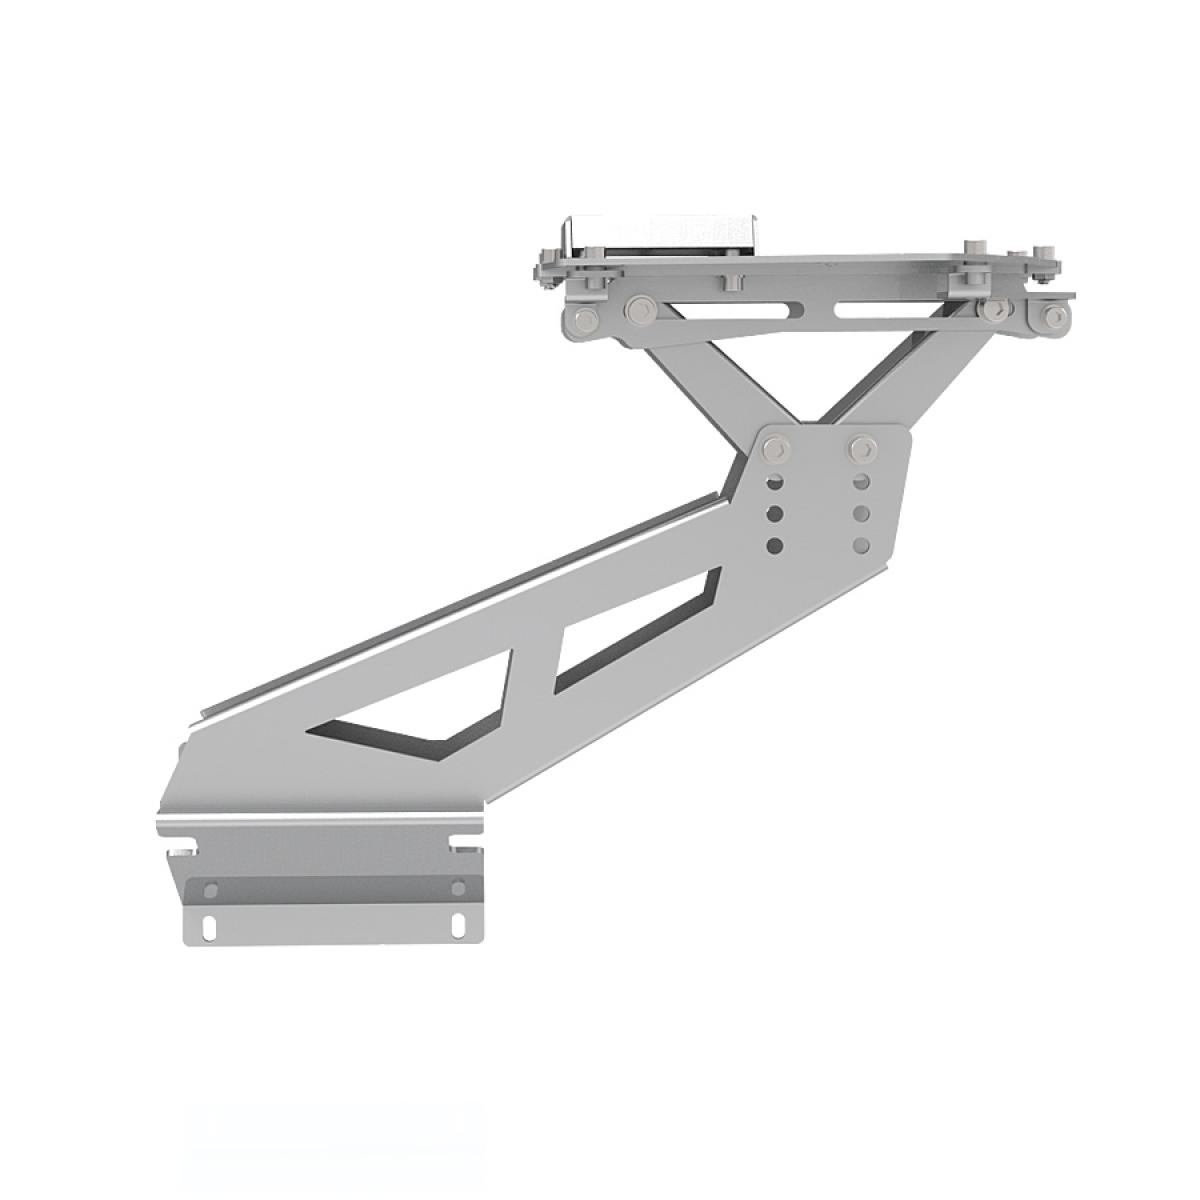 RSEAT S1 Shifter/Handbrake Upgrade kit Silver